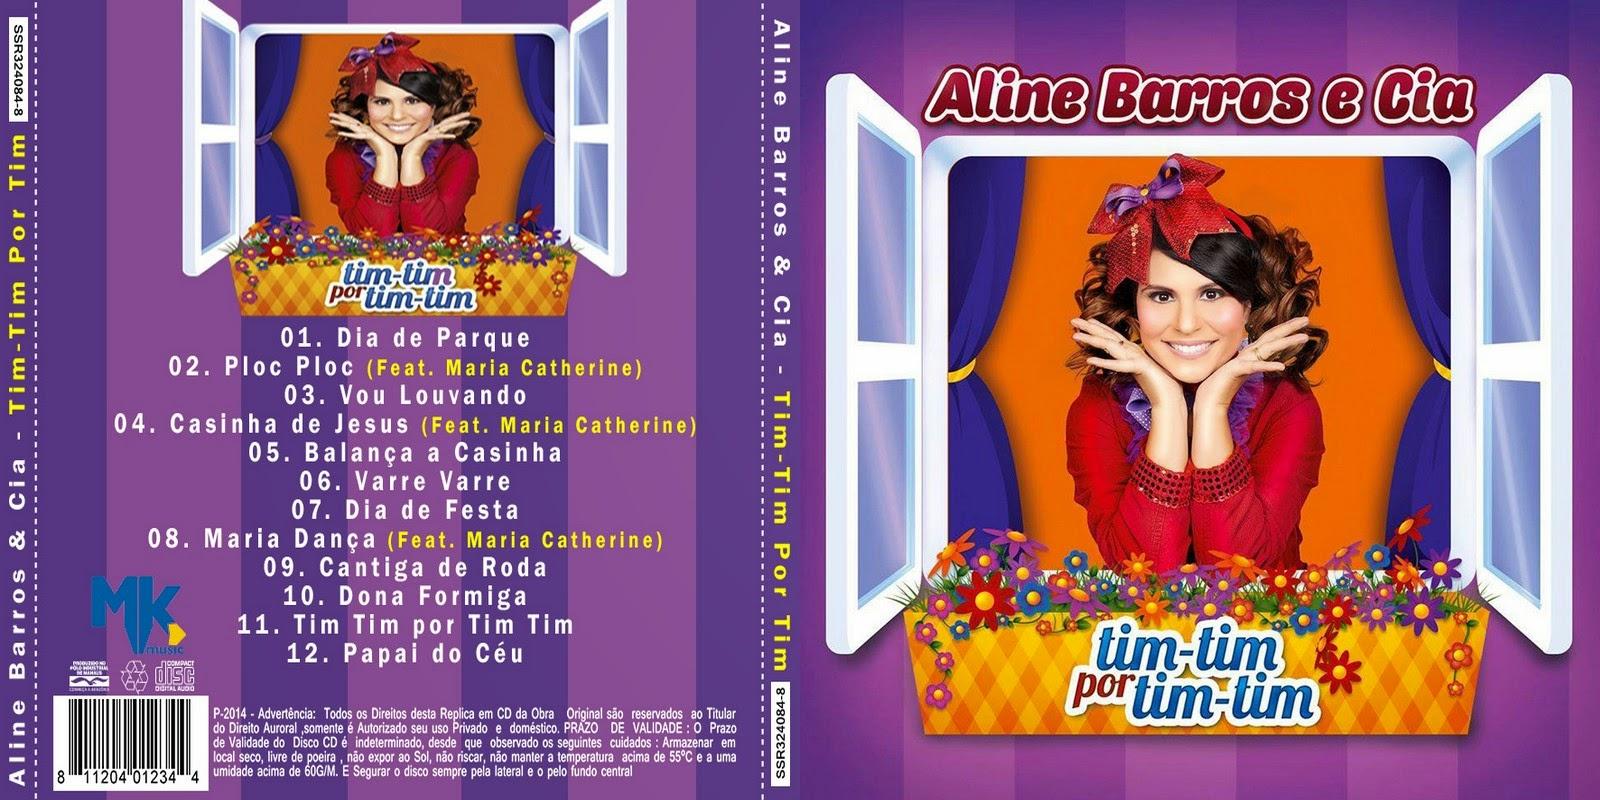 Aline Barros Aline Barros & Cia 2 aline barros cia 2 completo youtube downloader  deninfhearra.gq